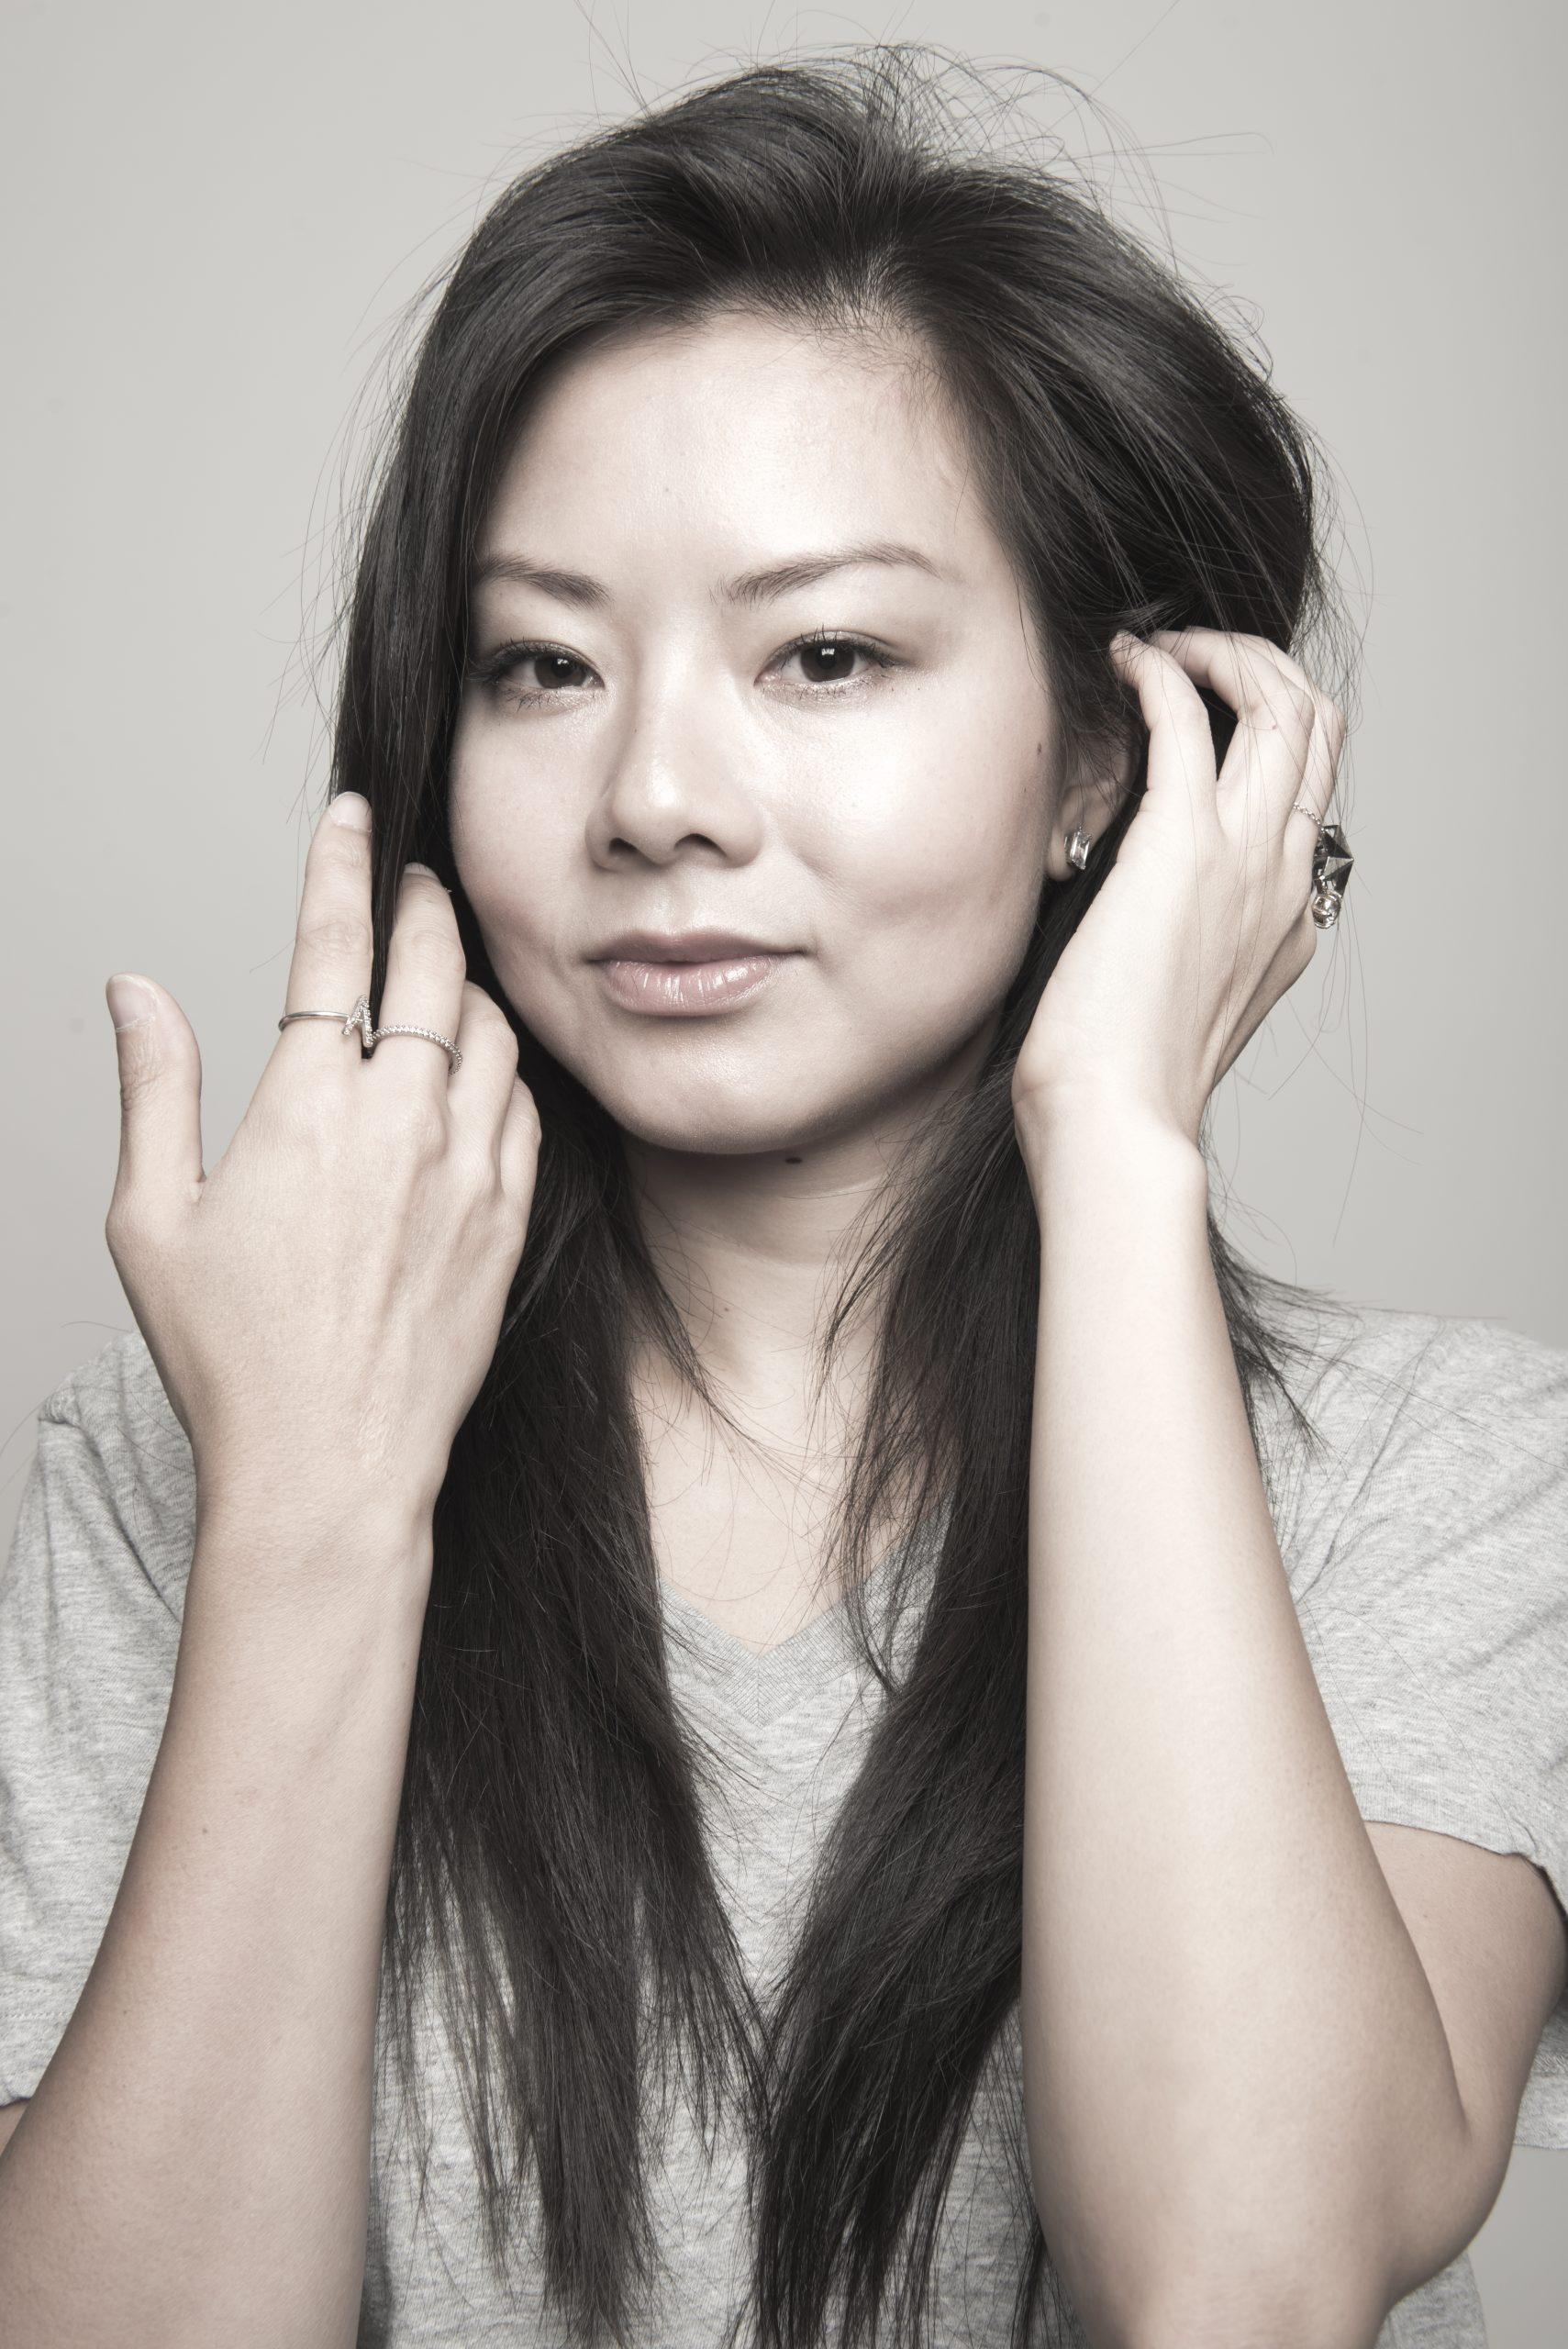 My wellness week facialist acupuncturist Ada Ooi